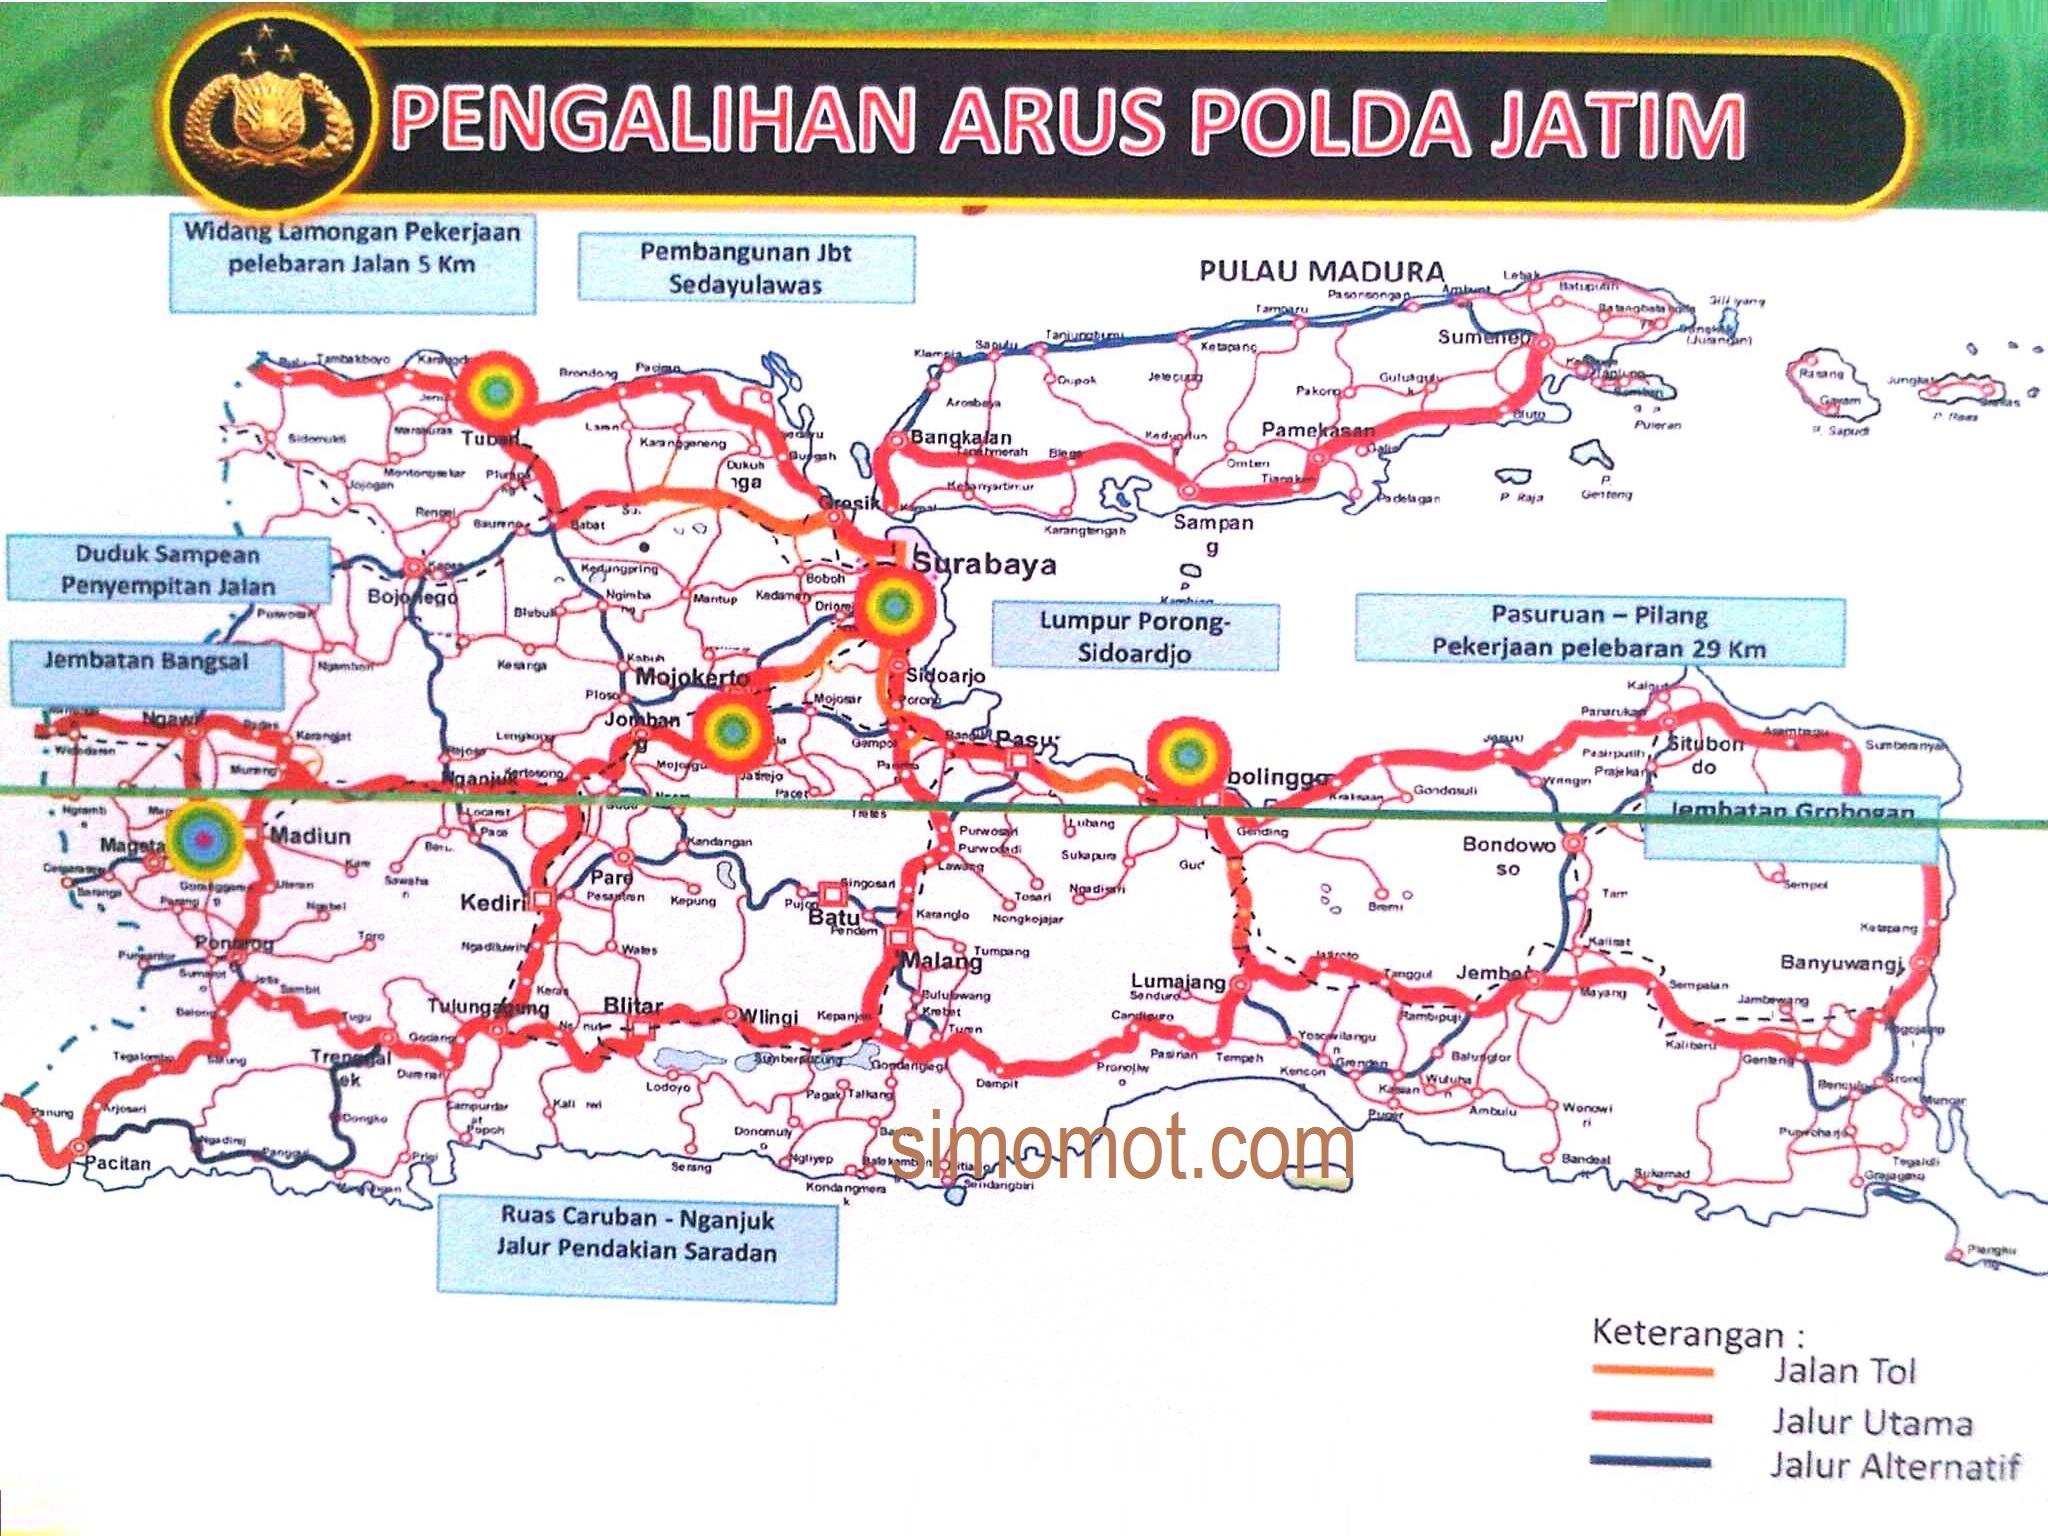 Inilah jalur-jalur alternatif pemudik di Jawa Timur - SIMOMOT